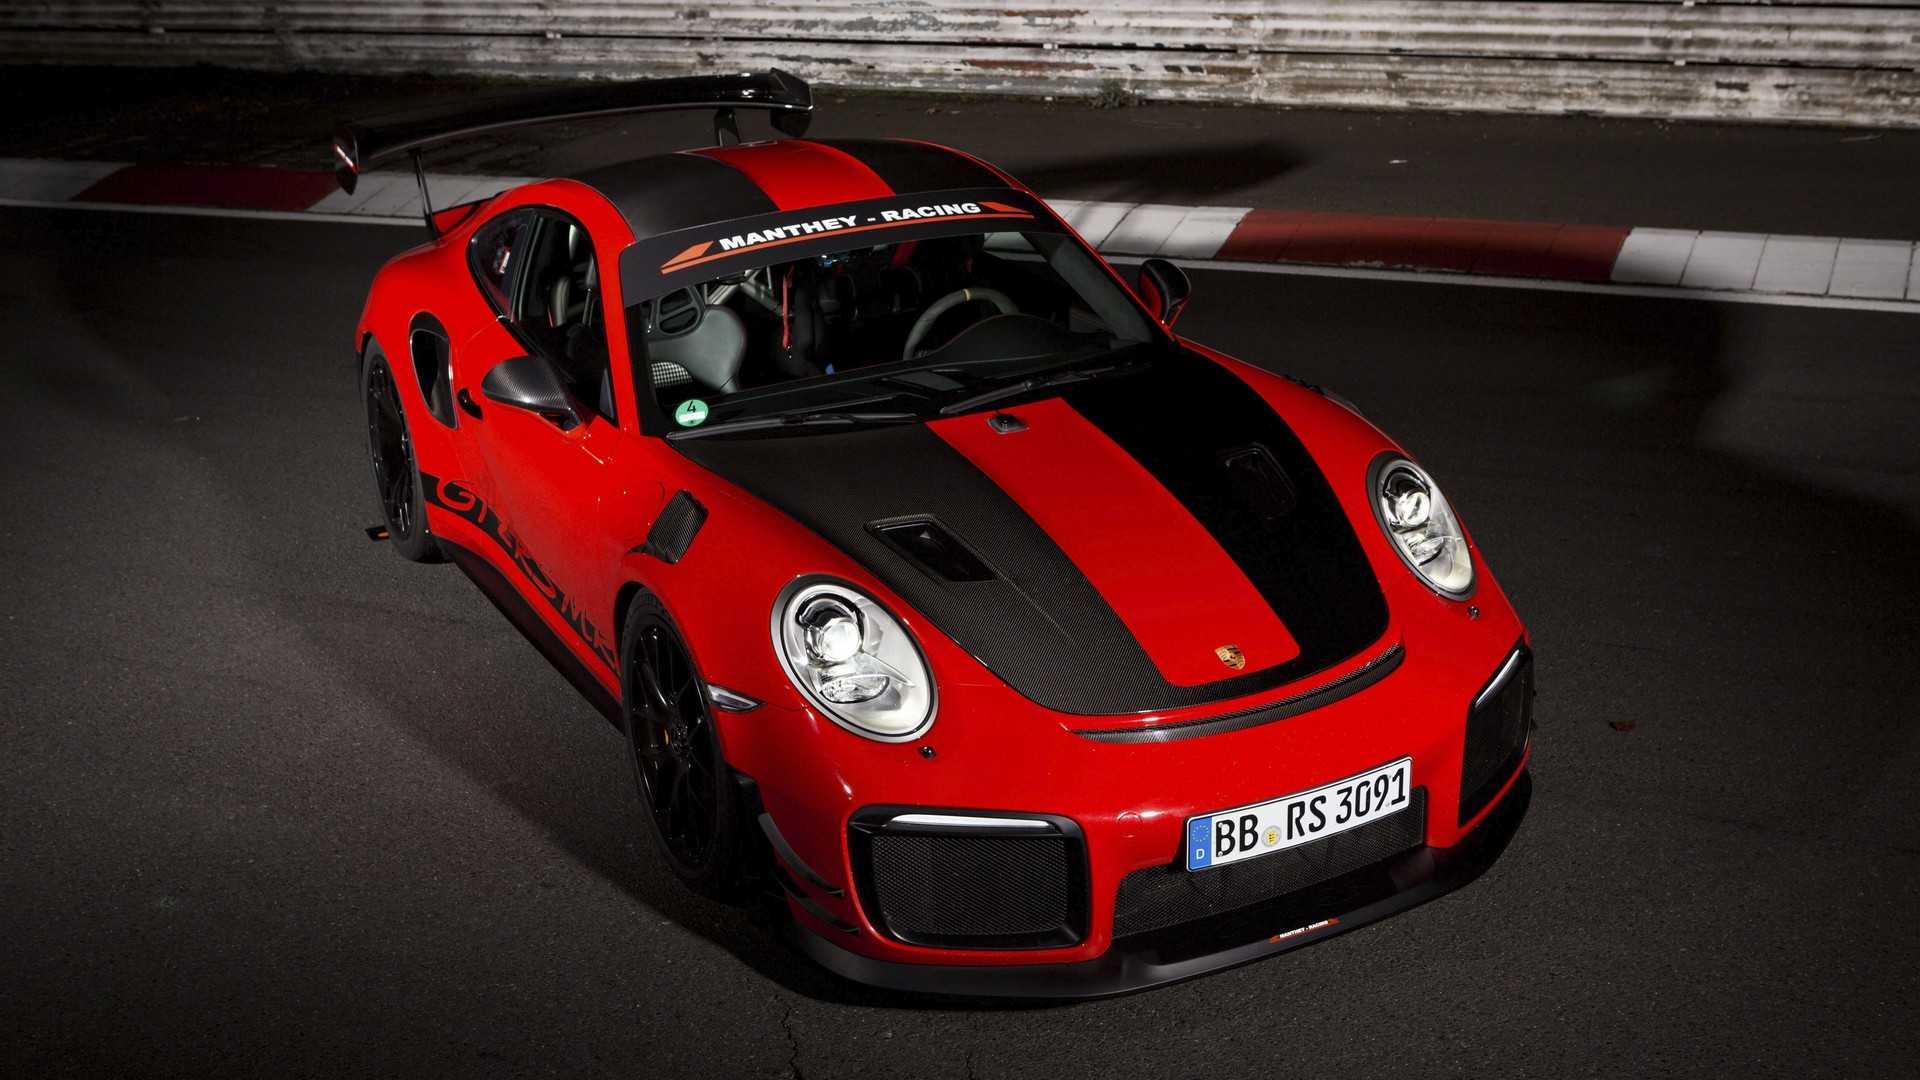 Phantom Car Wallpaper Porsche 911 Gt2 Rs Mr Becomes Fastest Road Legal Car